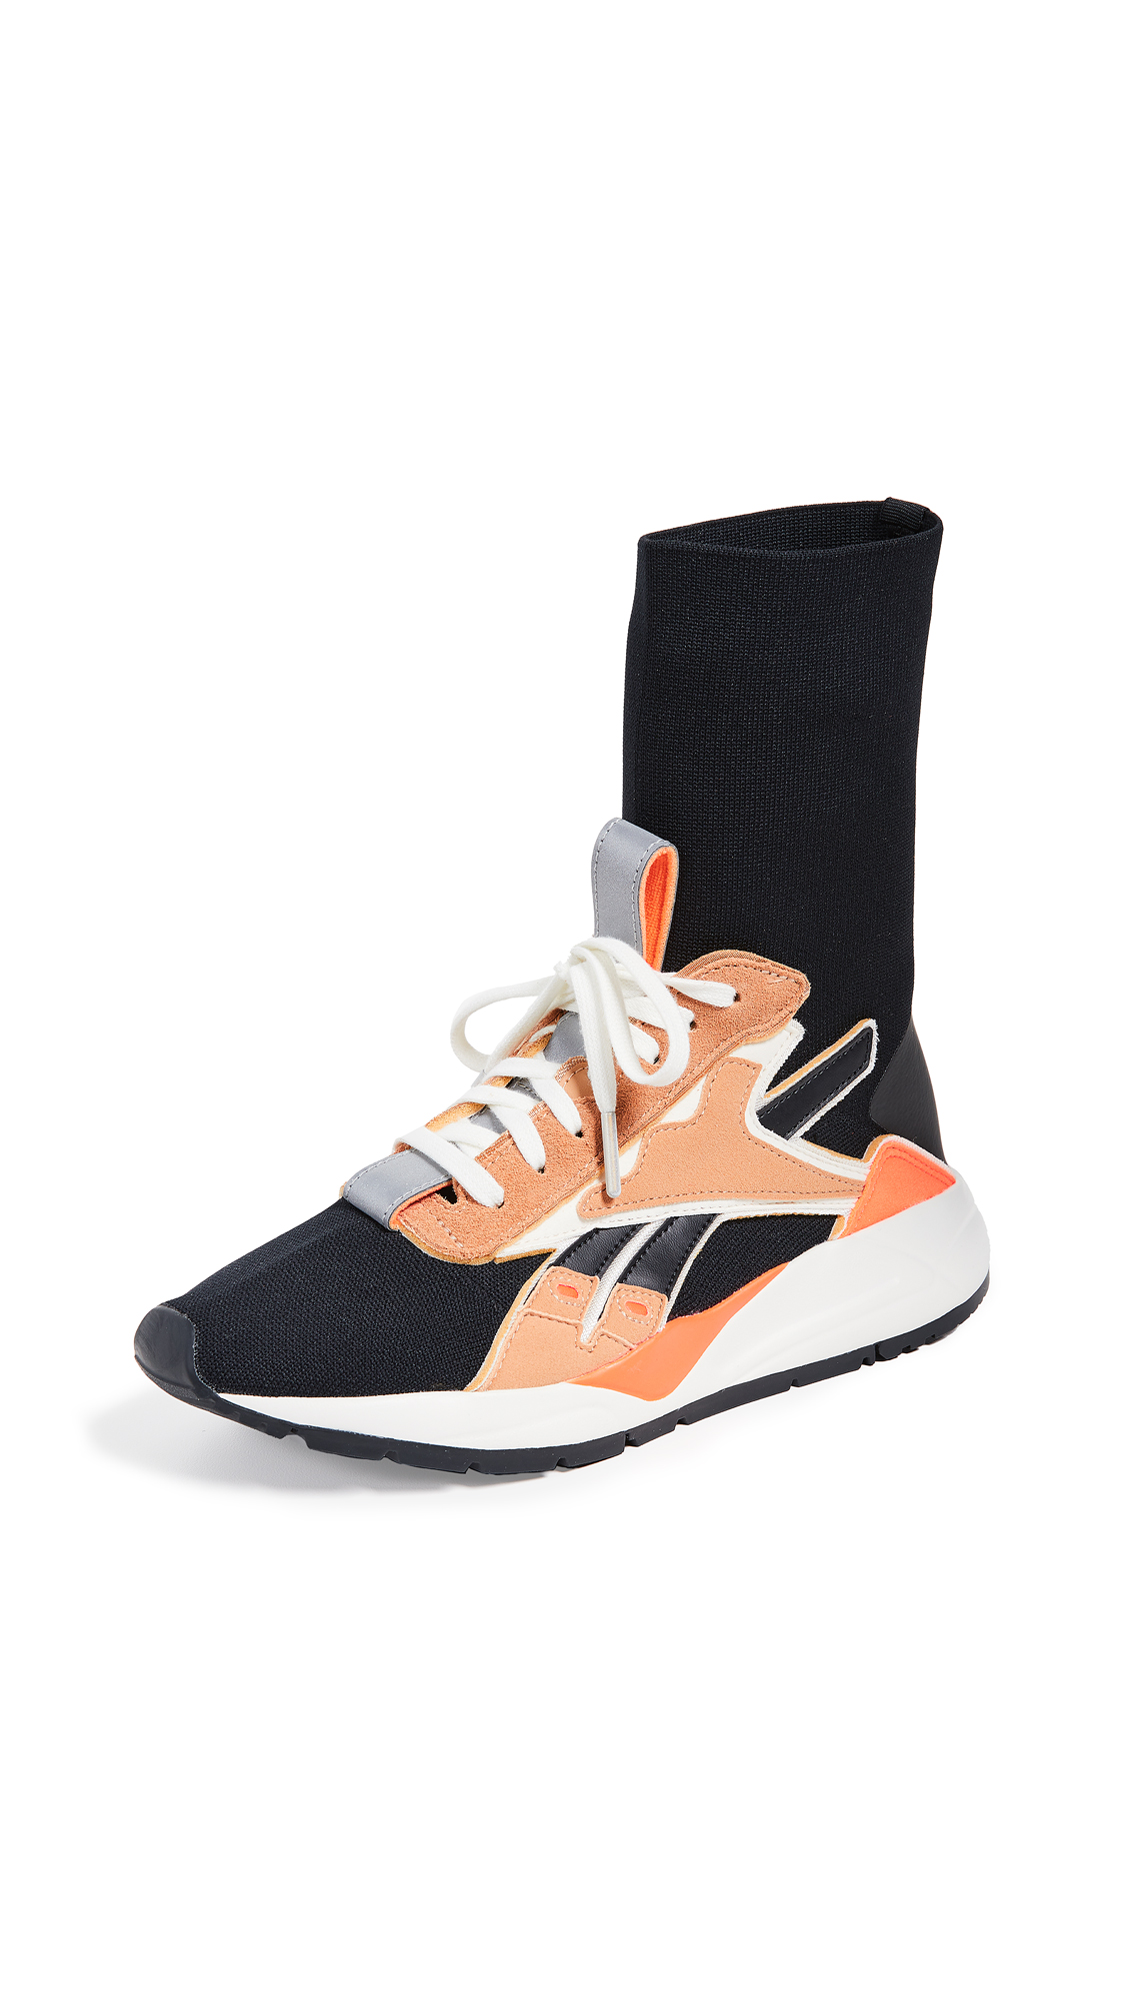 Reebok x Victoria Beckham VB Bolton Sock Sneakers - Black/Orange/Sahara/White